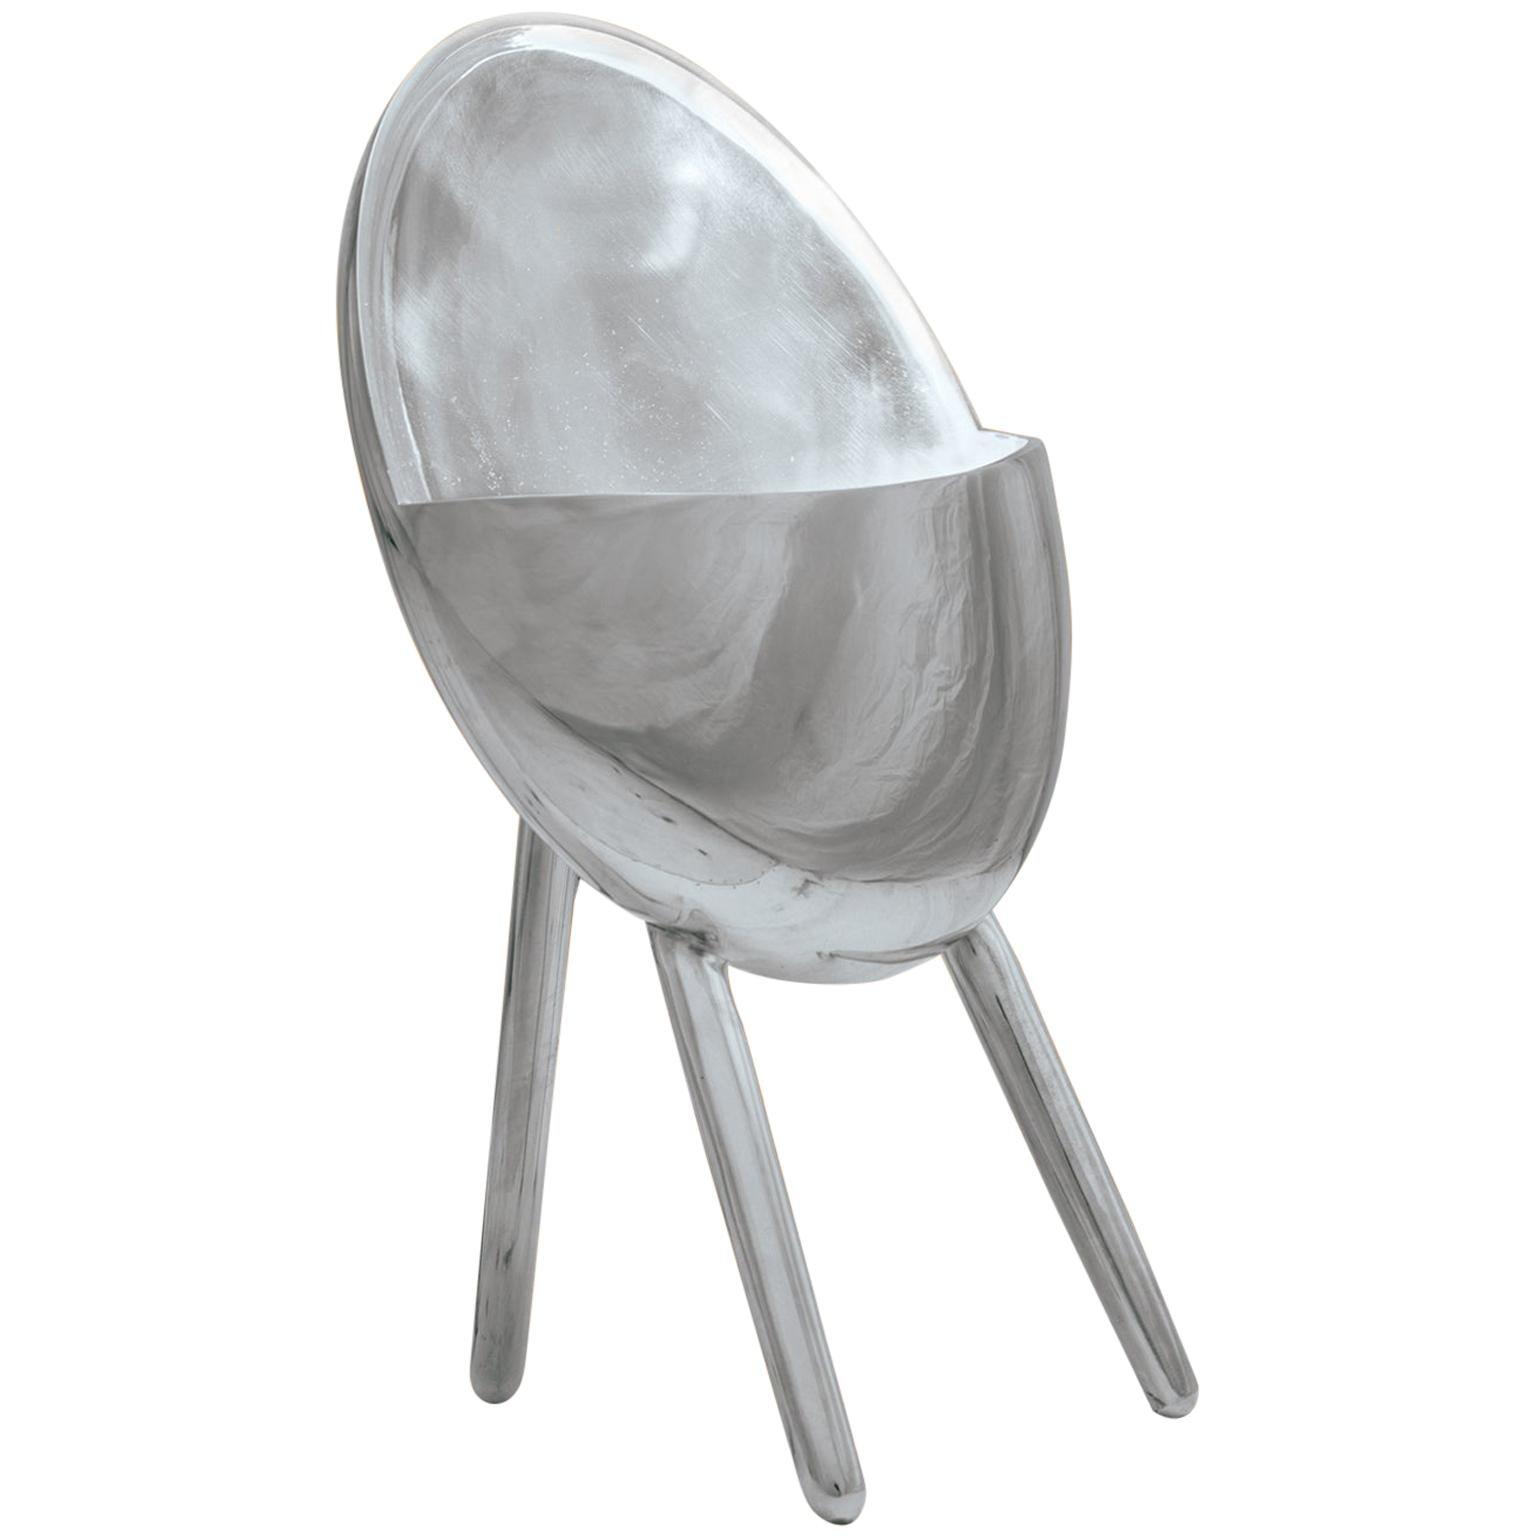 Contemporary Table Lamp in Cast Aluminum